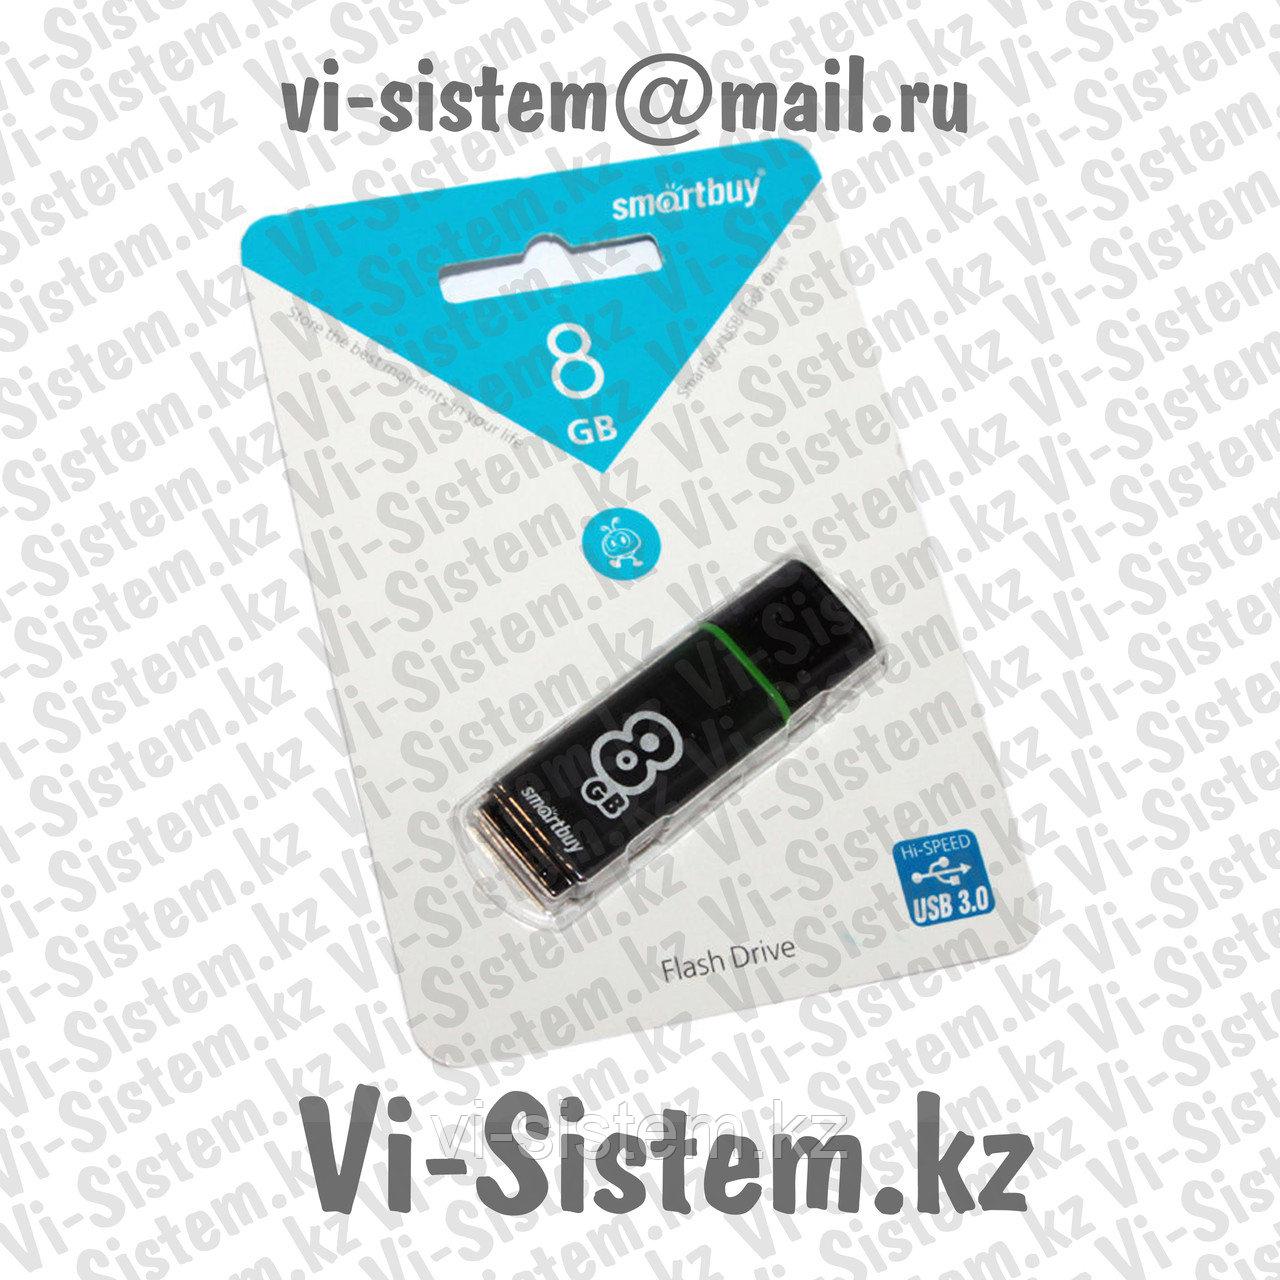 USB 3.0 Флеш Накопитель SmartBuy 8GB (Флешка)